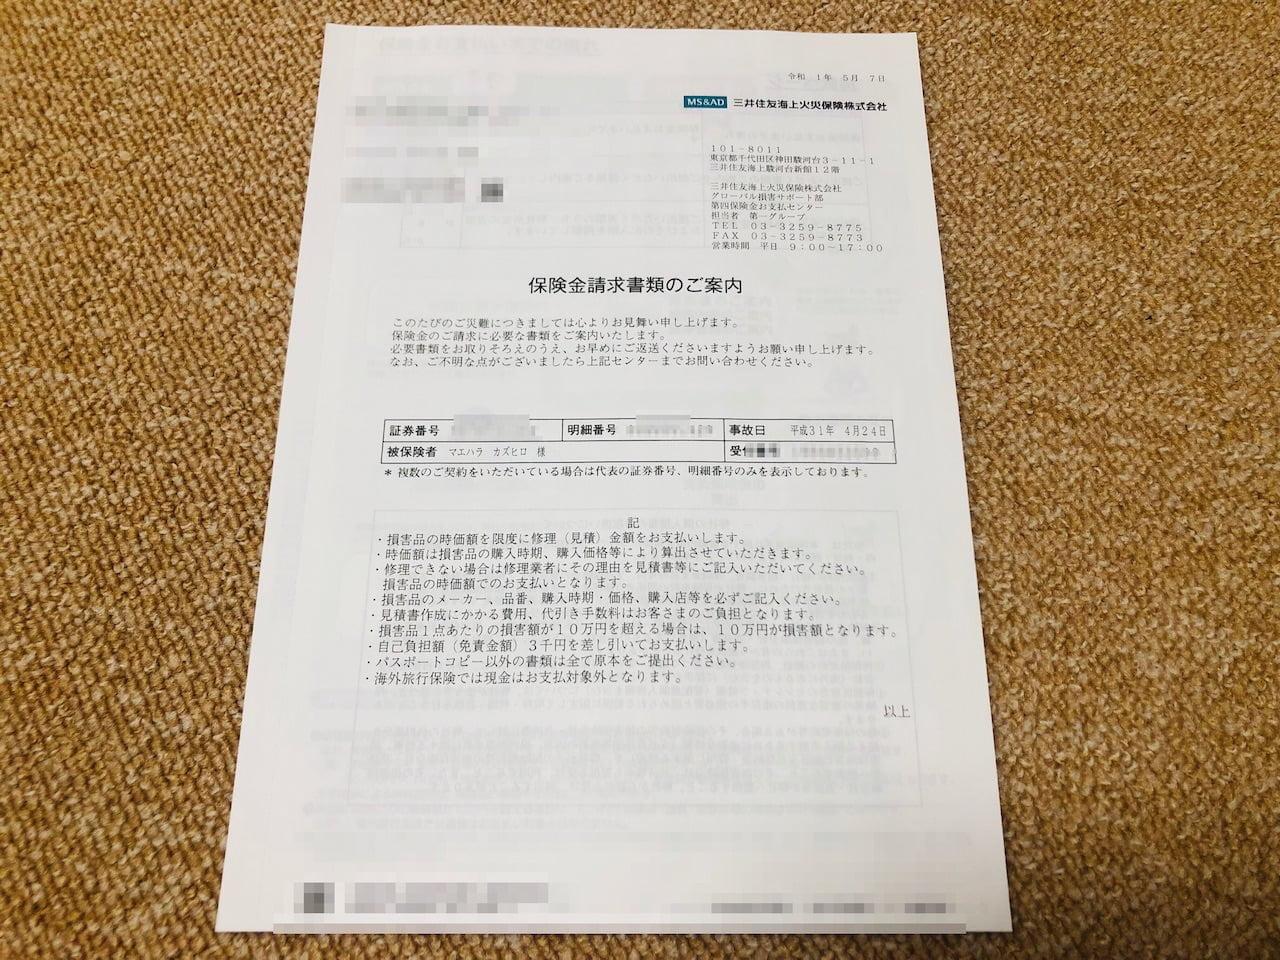 Eposcard inshurance macbookpro 00086